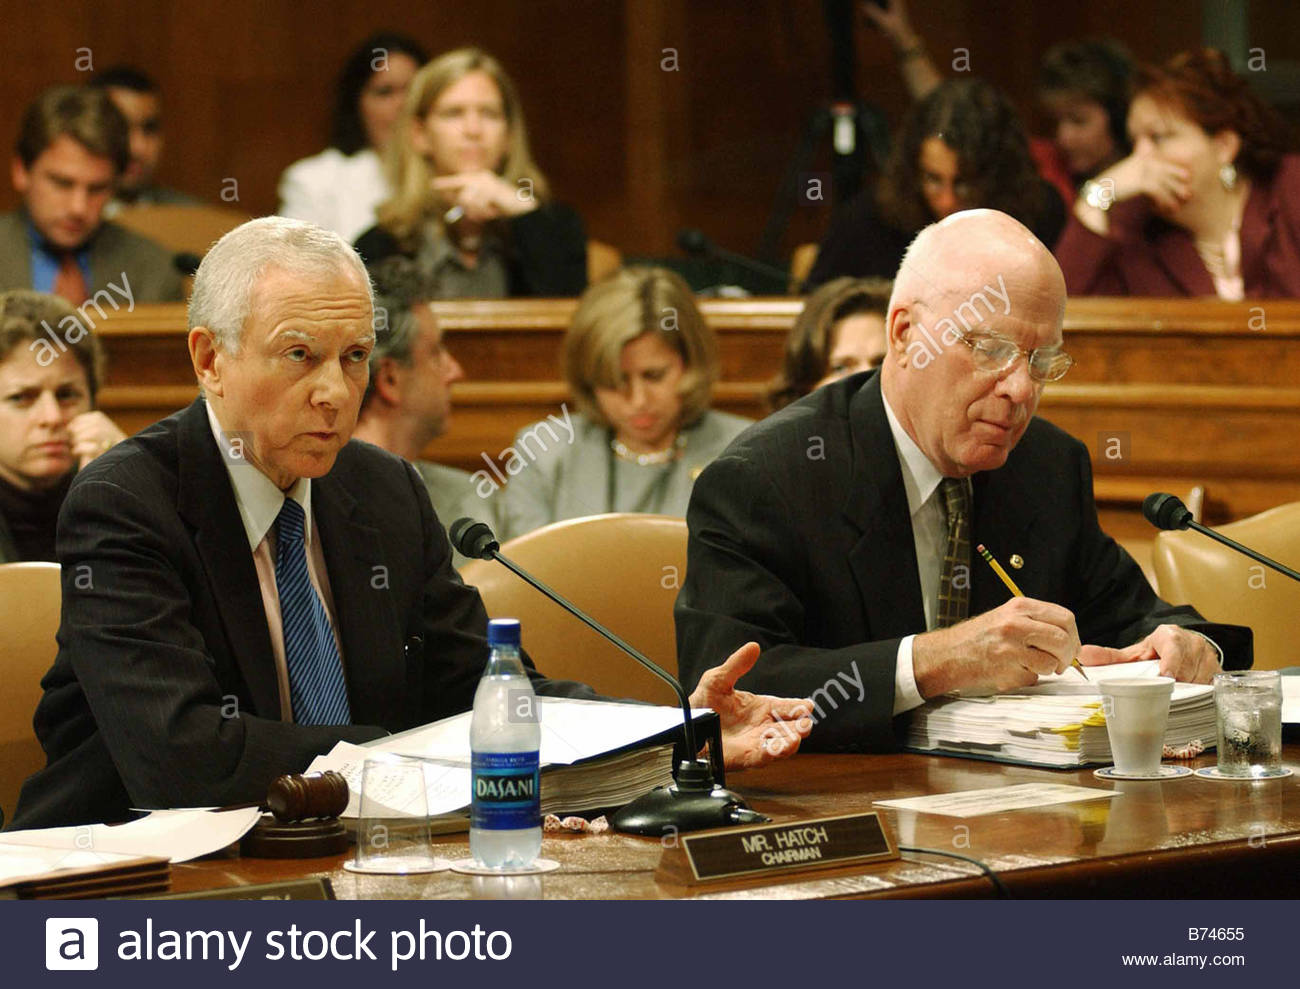 9 09 04 SENATE JUDICIARY MARKUP Chairman Orrin G Hatch R Utah and ranking Democrat Patrick J Leahy D Vt during the - Stock Image